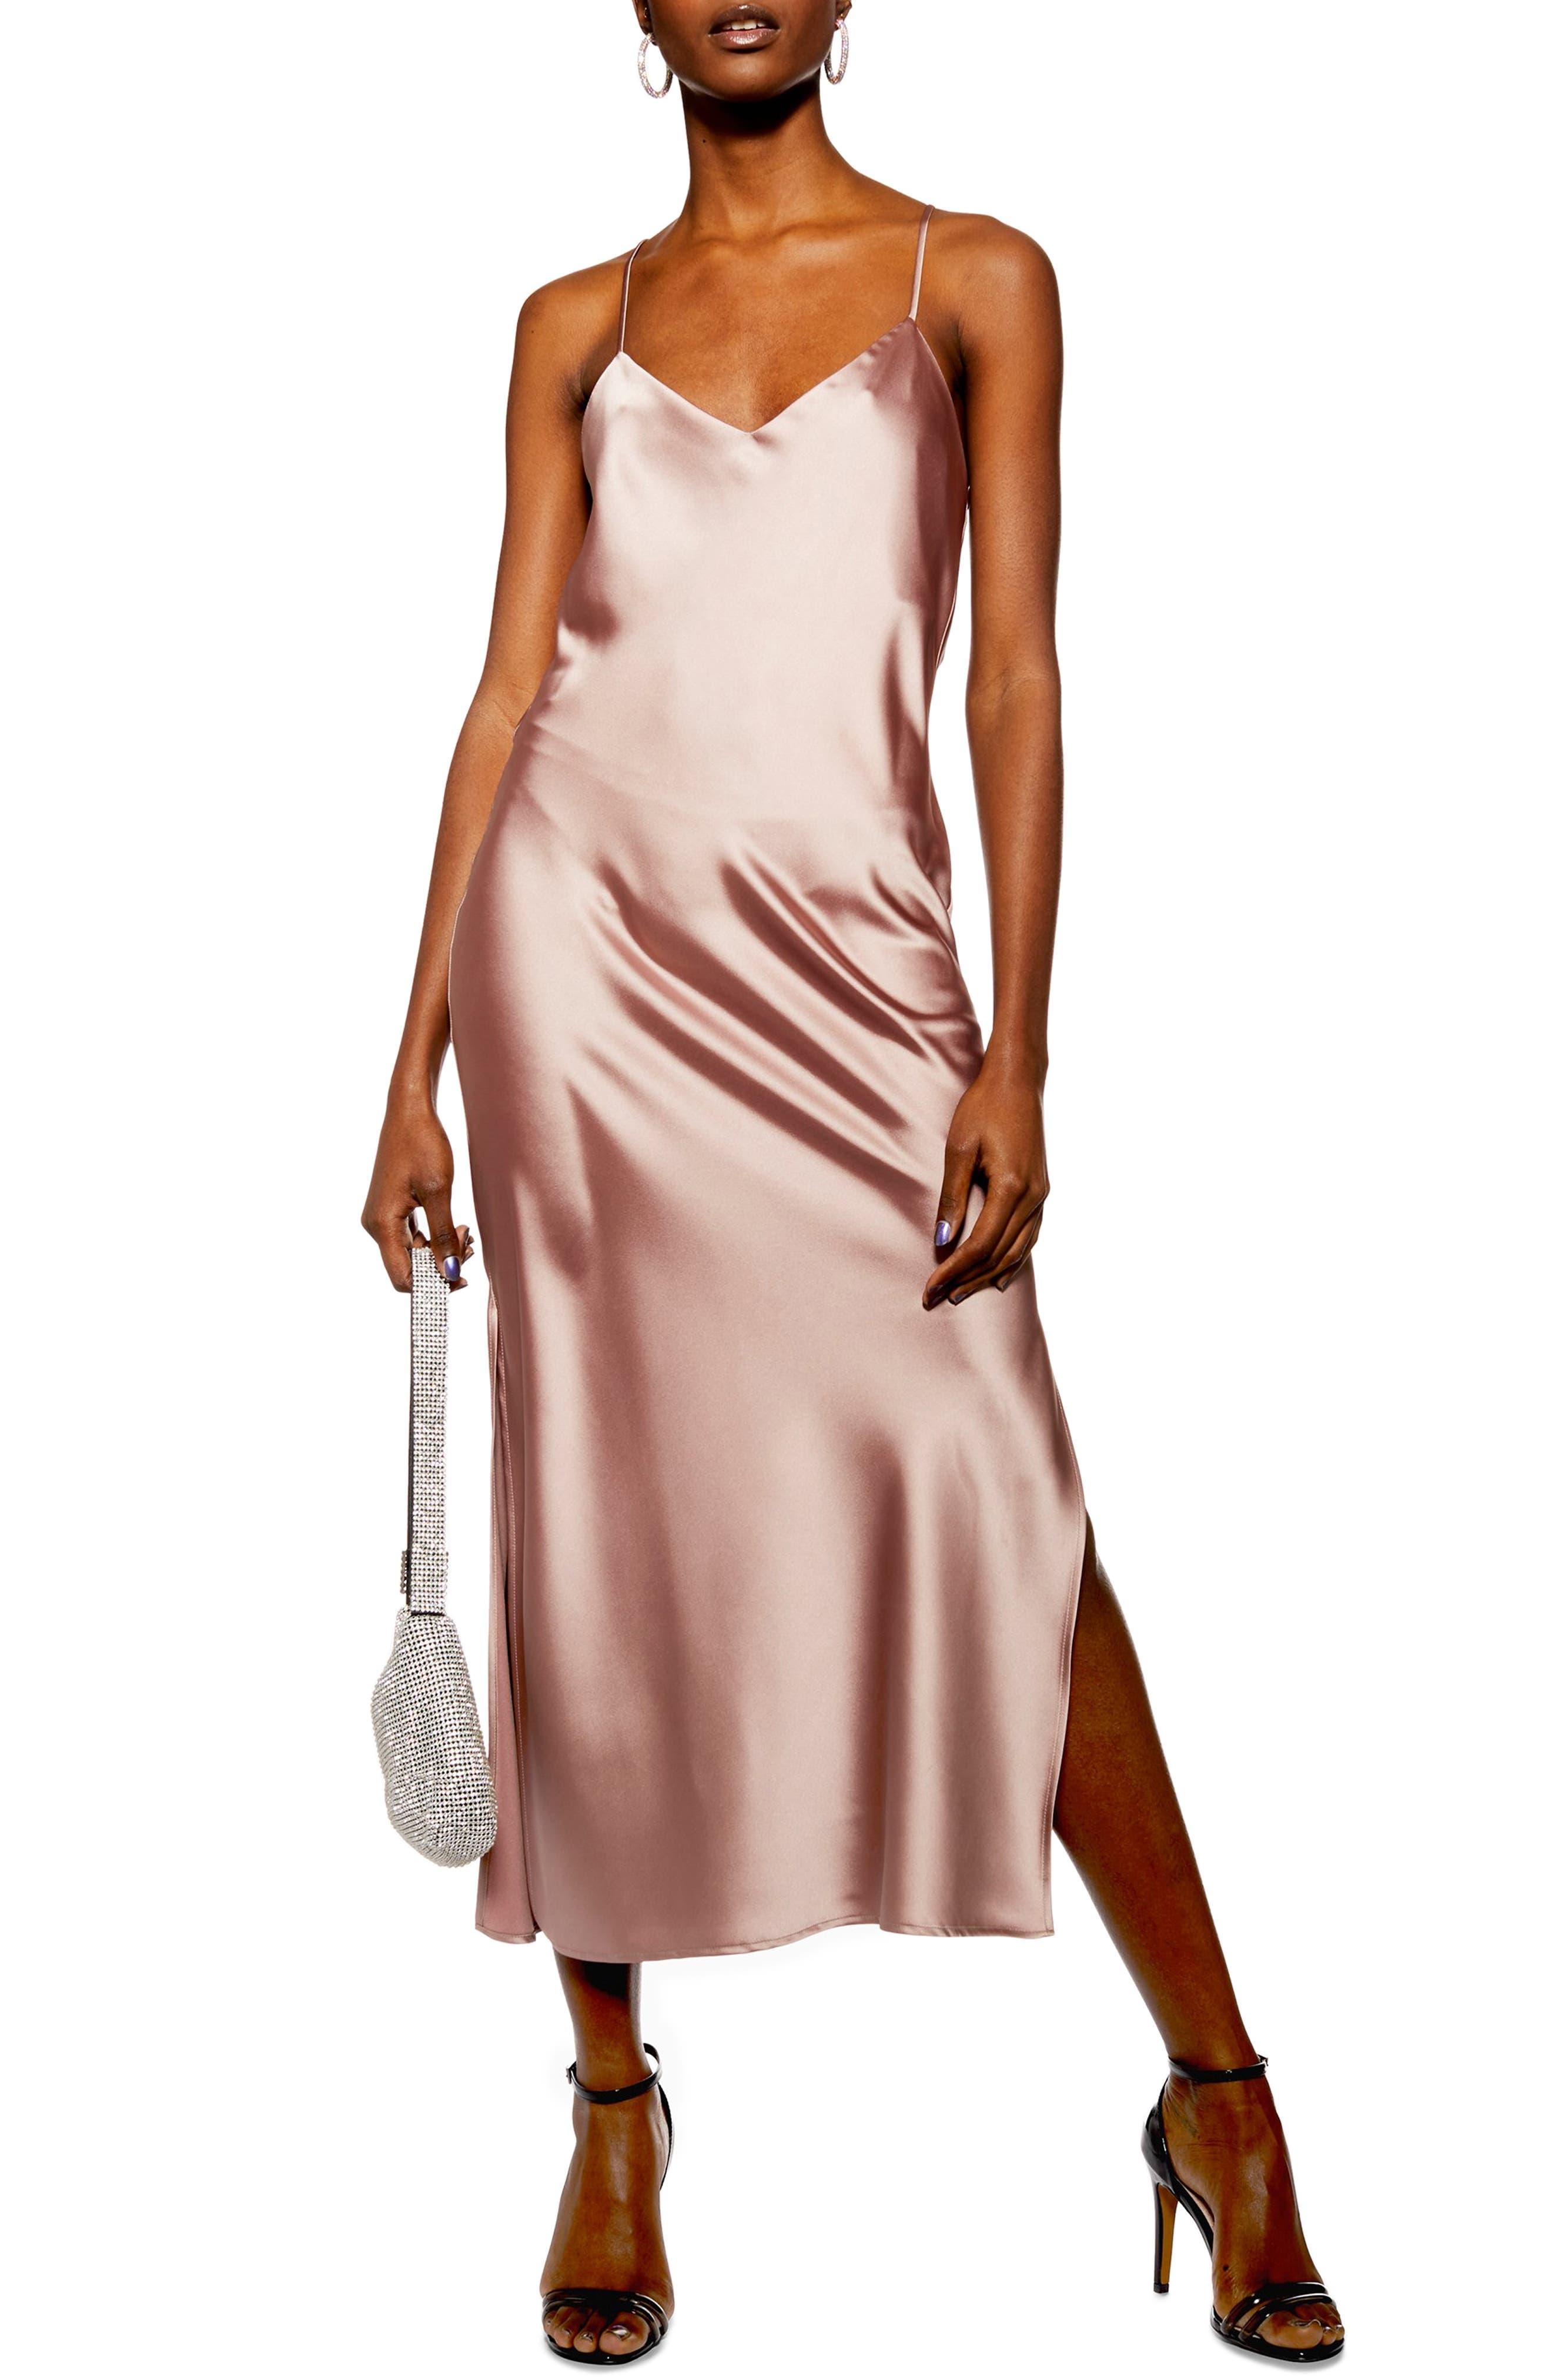 Topshop Plain Satin Slipdress, US (fits like 6-8) - Pink